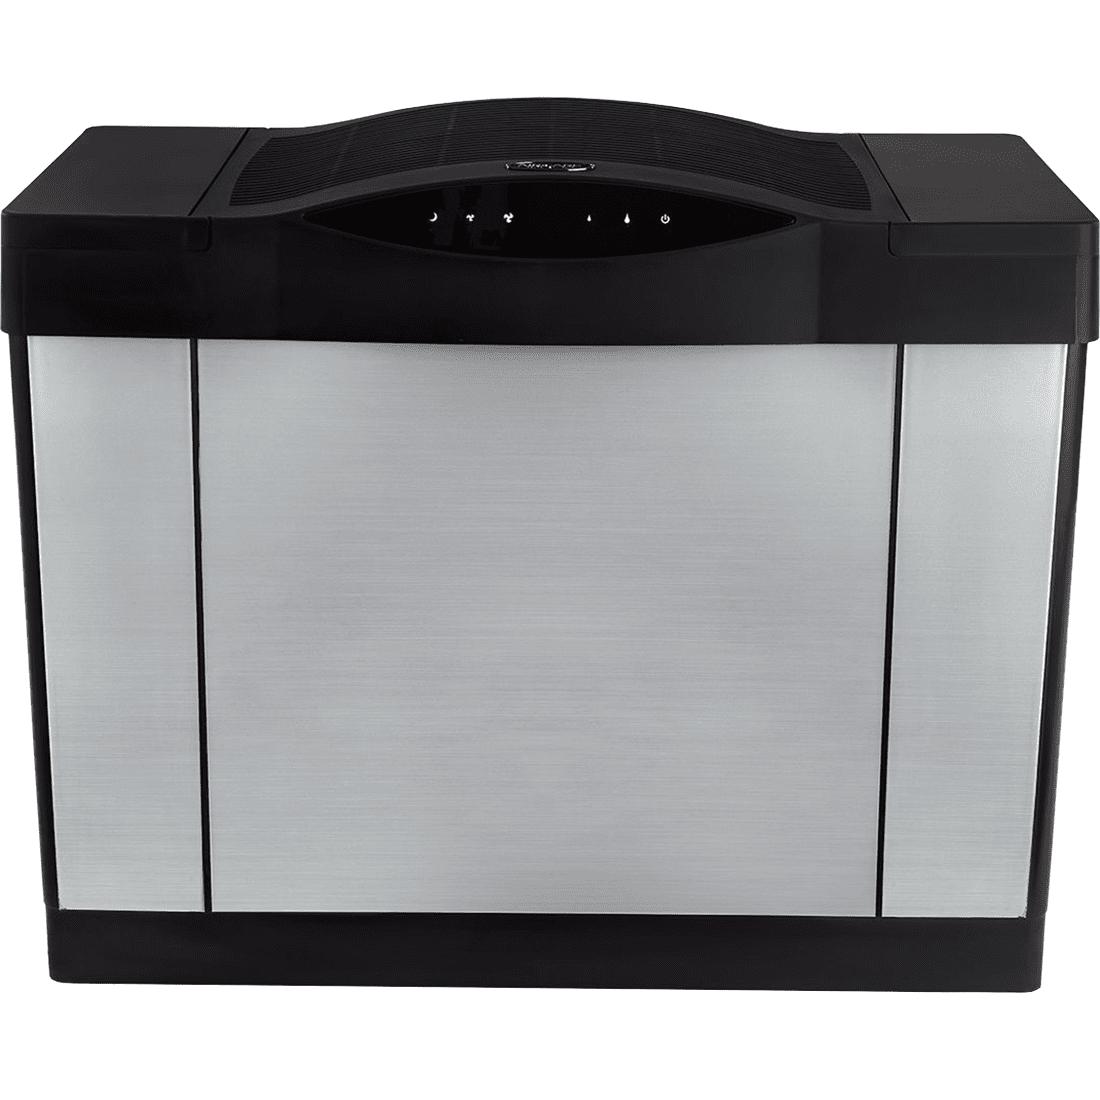 Image of Aircare Executive Whole-house Console Digital Humidifier